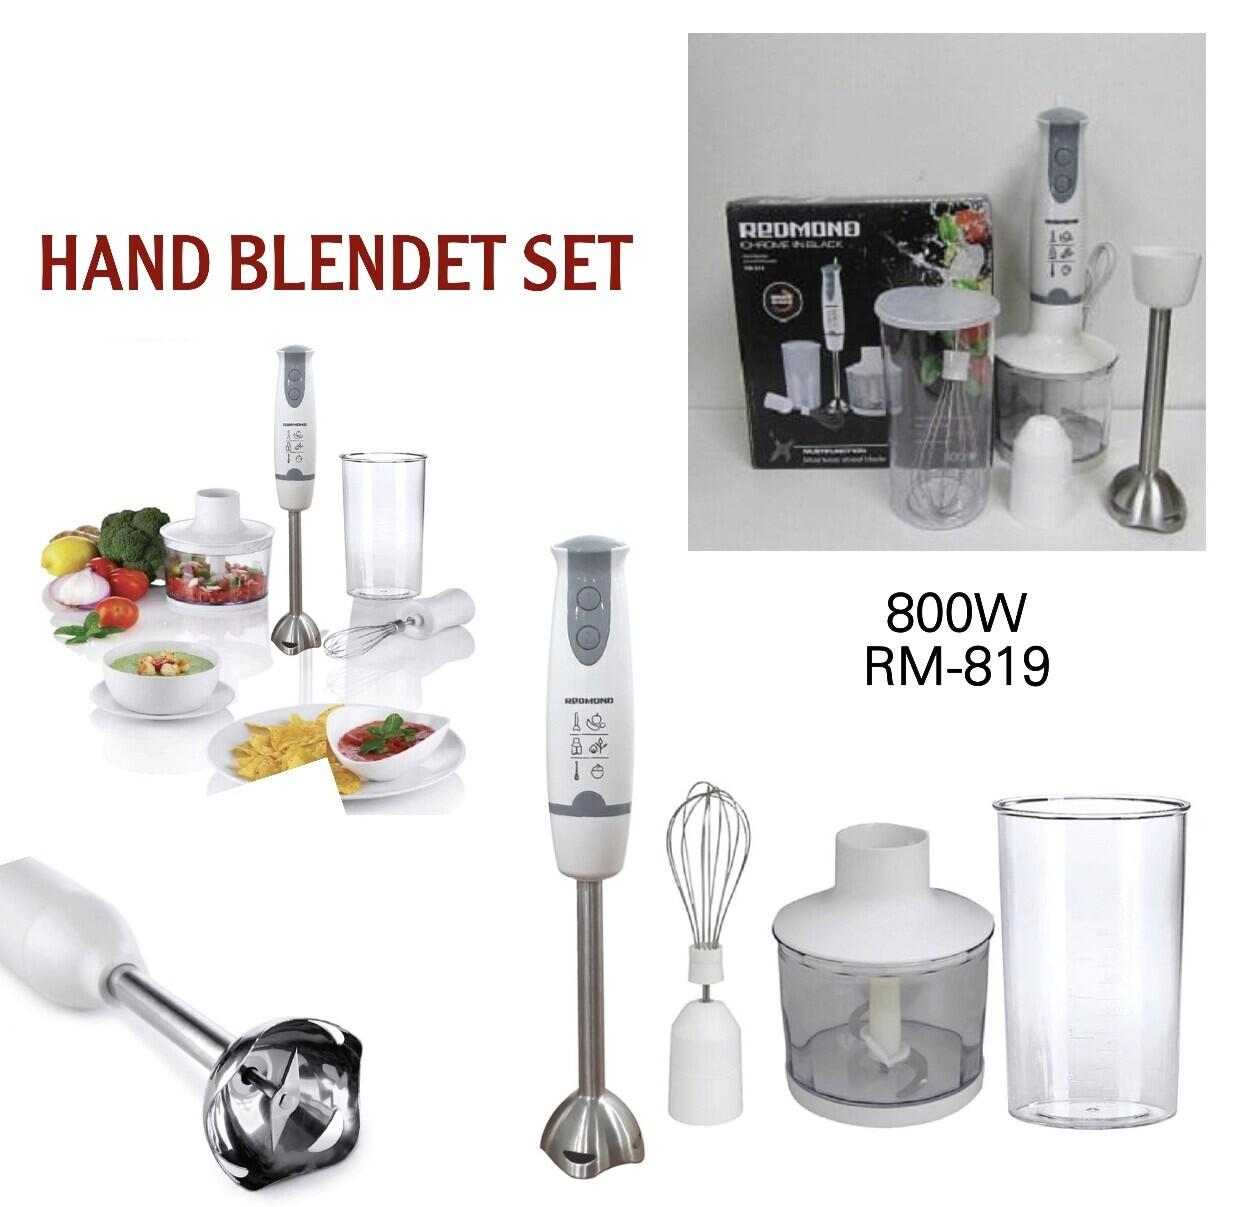 Hand Blender Set (RM-819)